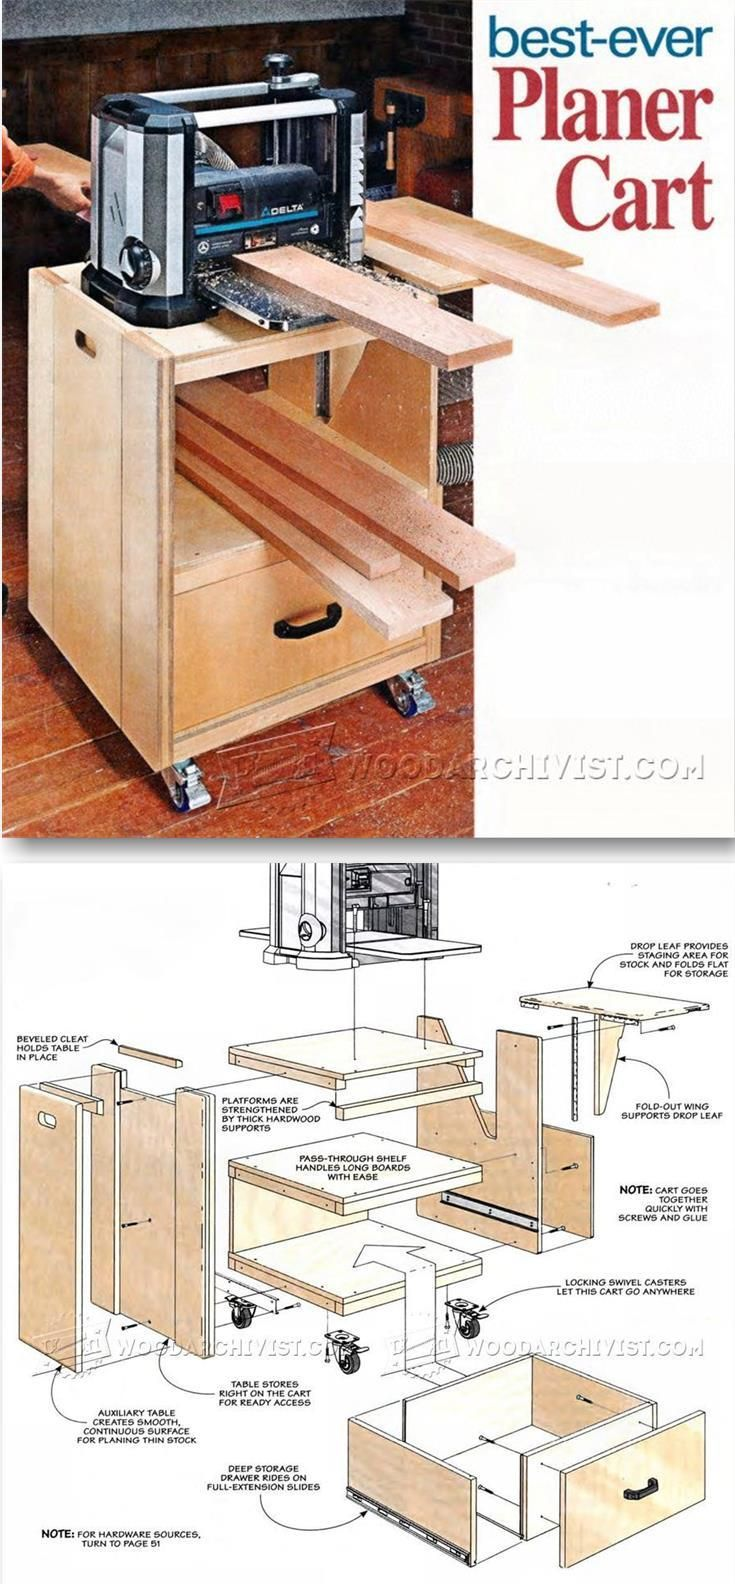 Planer Cart Plans - Planer Tips, Jigs and Fixtures | WoodArchivist.com